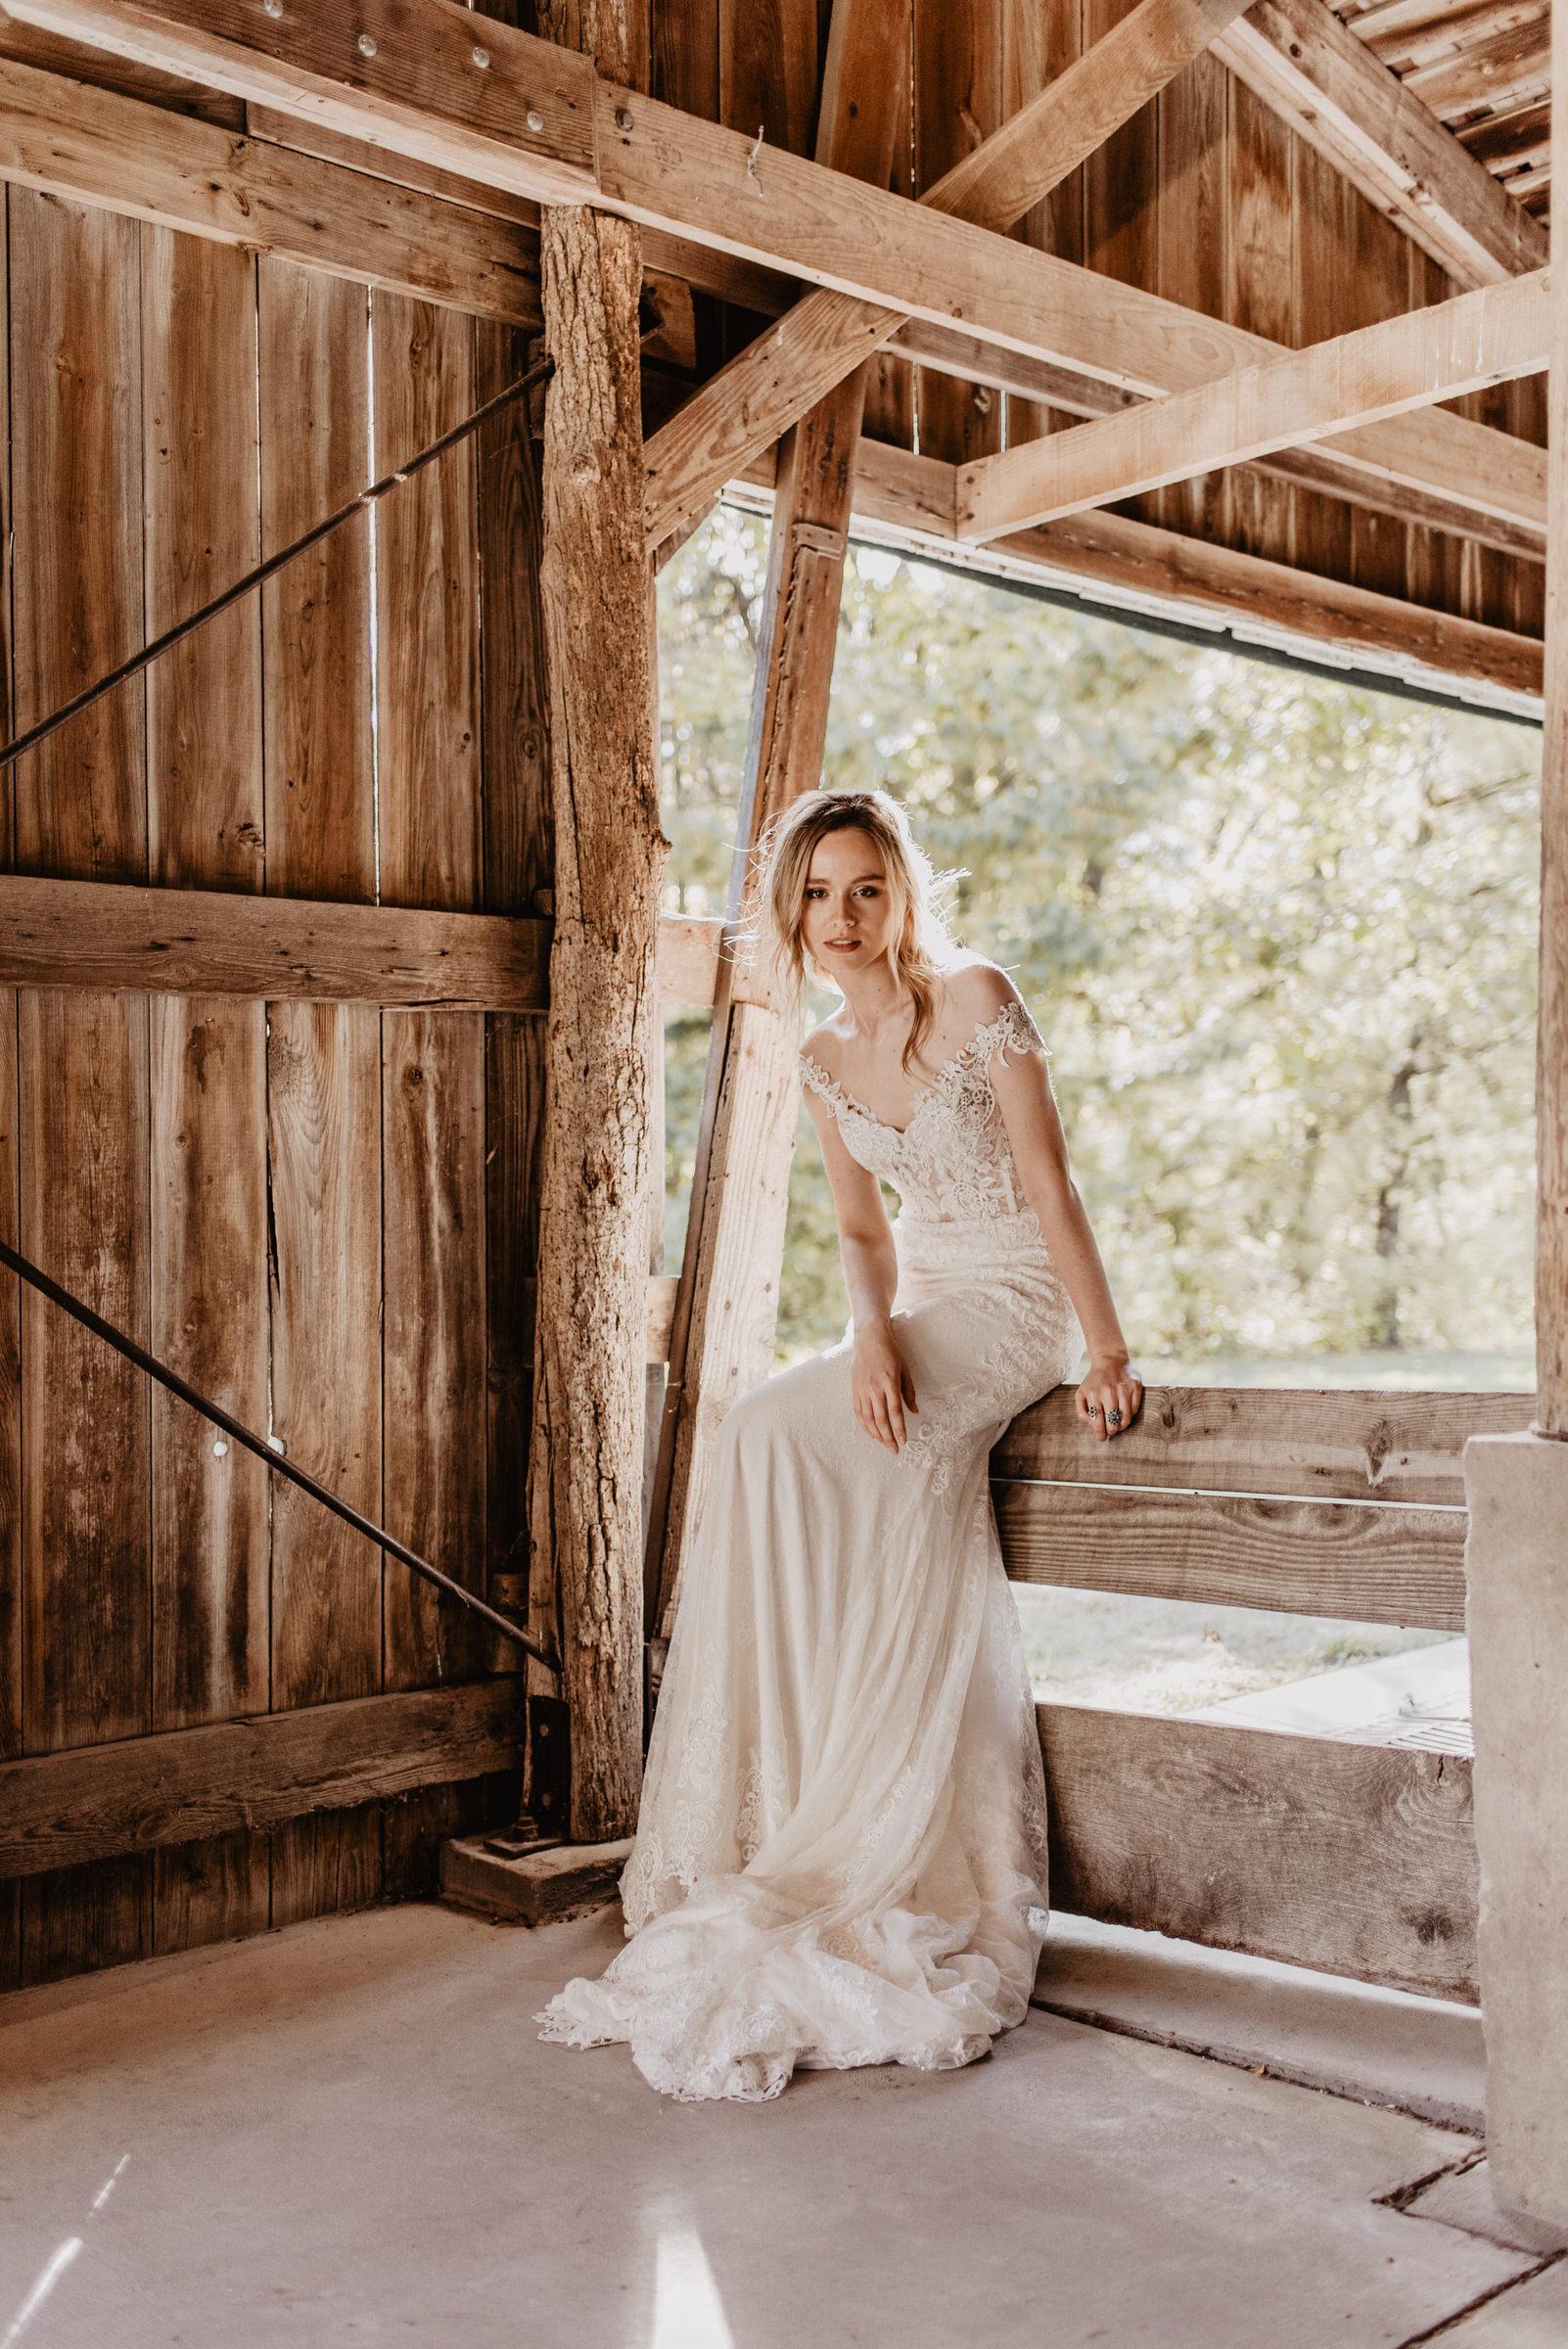 Kaylie-Sirek-Photography-NWD-SS19-22.jpg